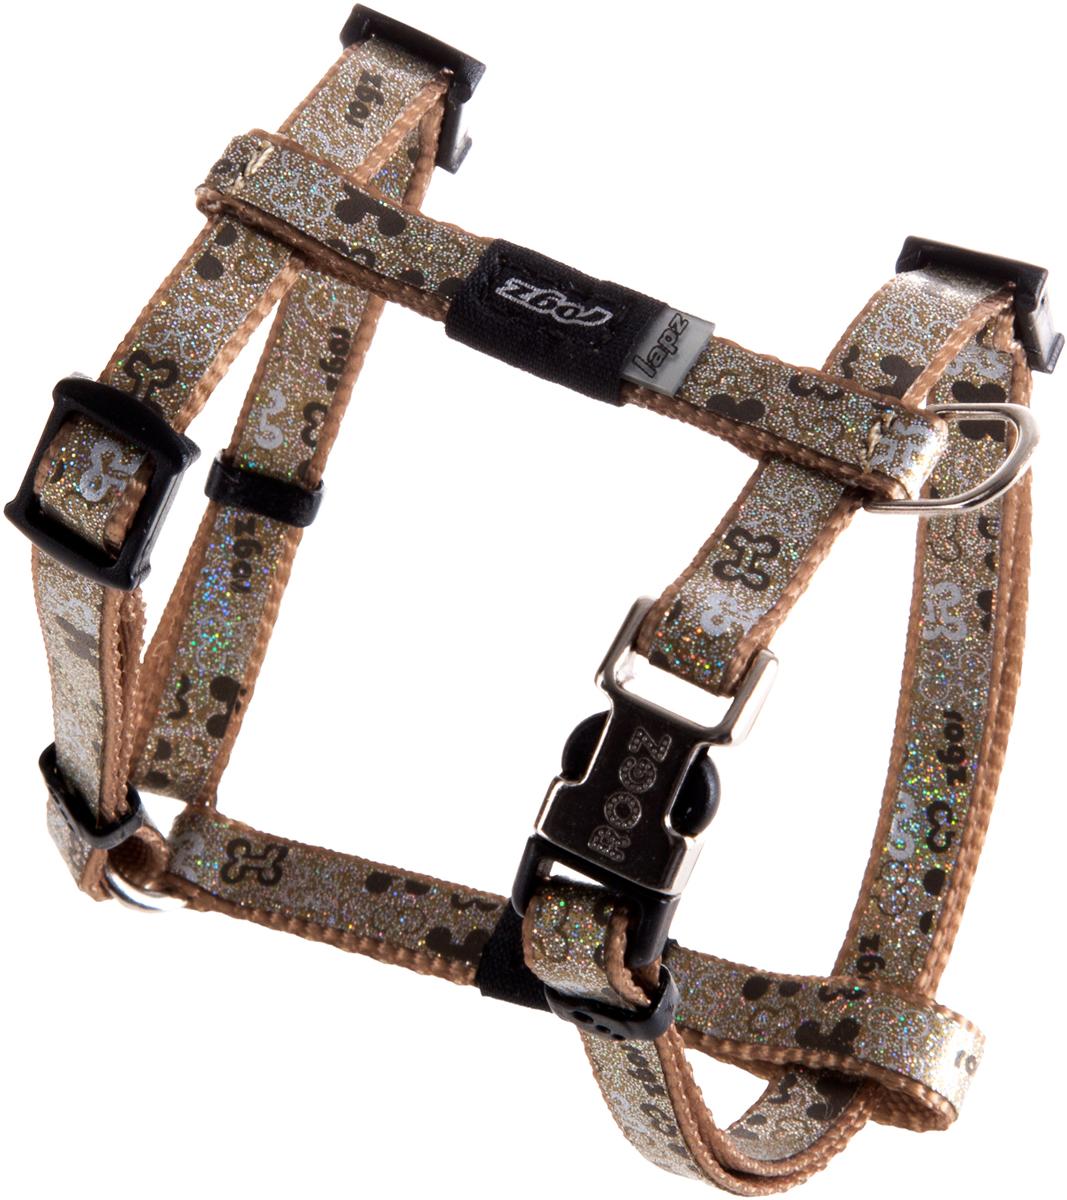 Шлейка для собак Rogz  Trendy , цвет: коричневый, ширина 0,8 см. Размер XS